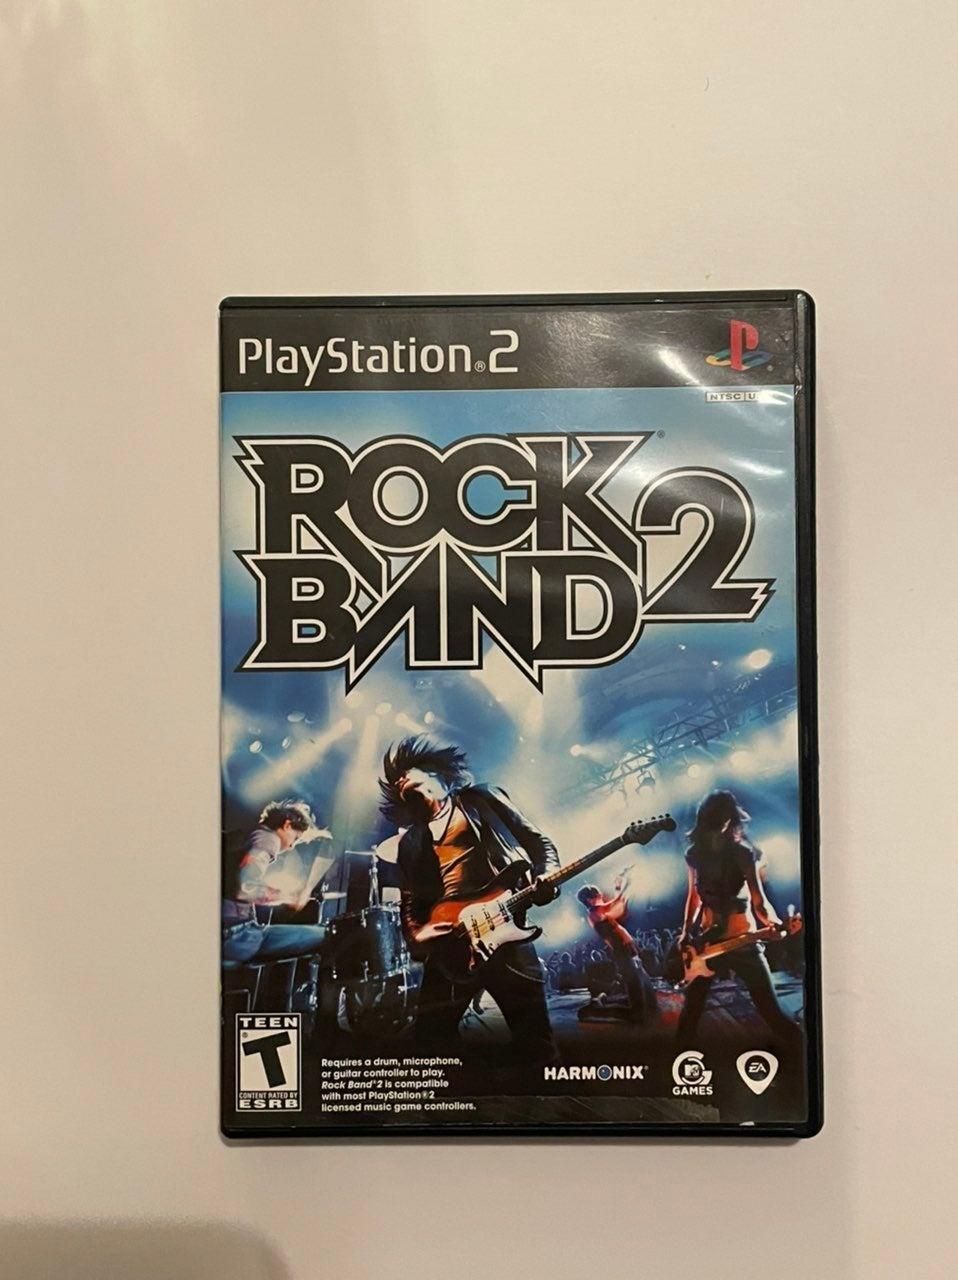 Rock Band 2 on Playstation 2